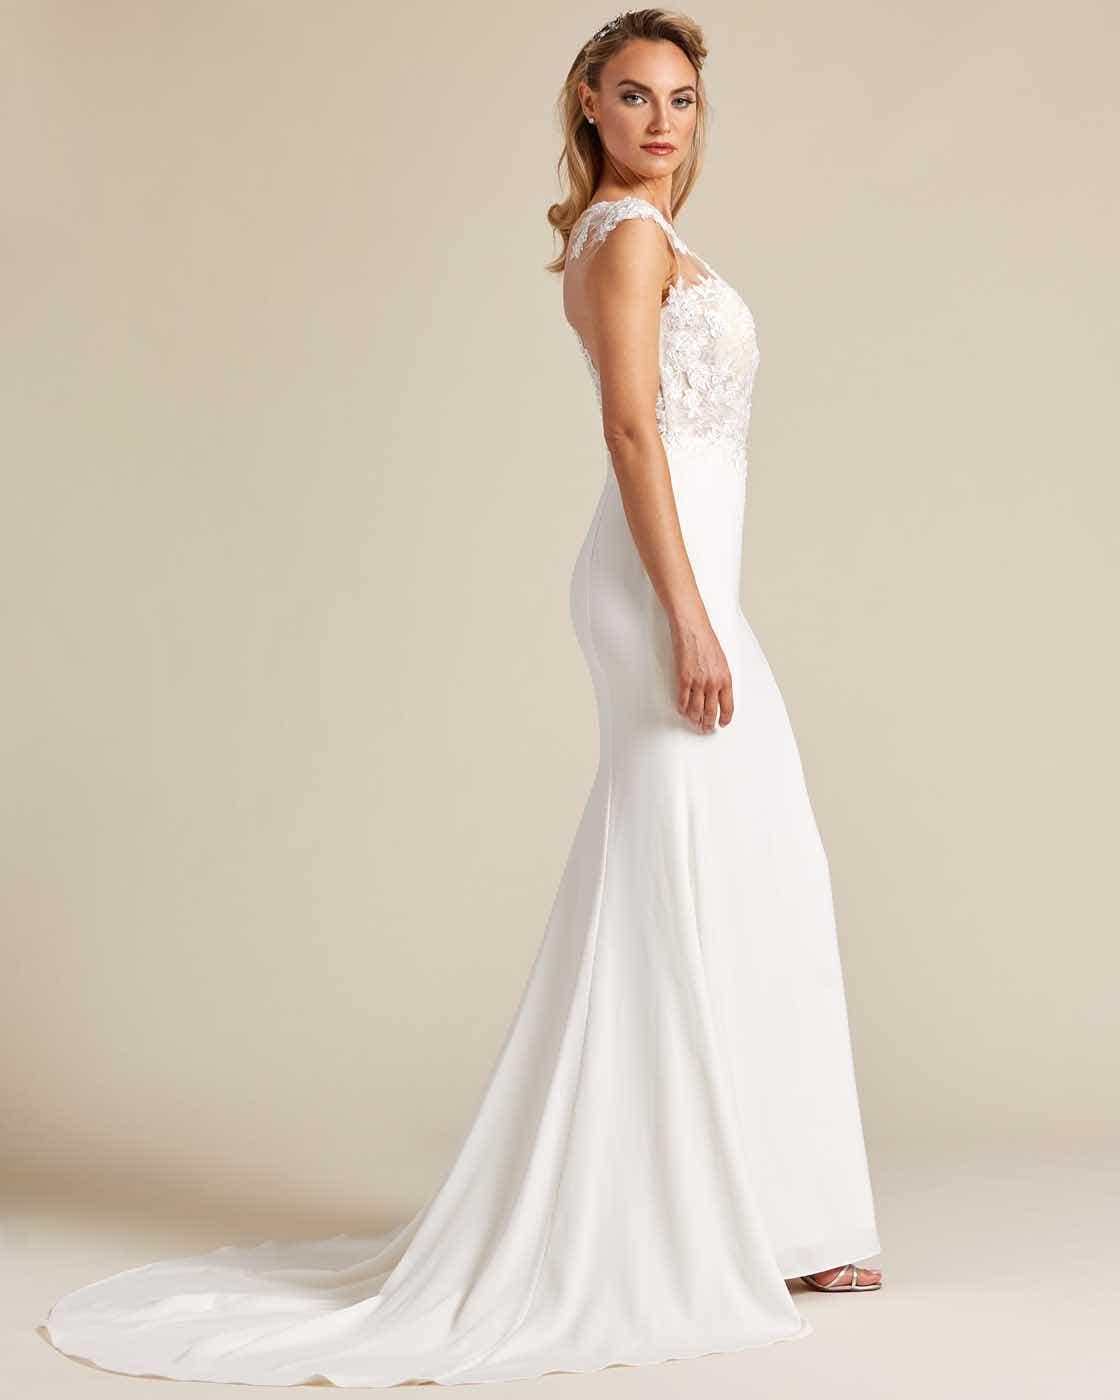 Cream White Button Down Back Wedding Dress - Side